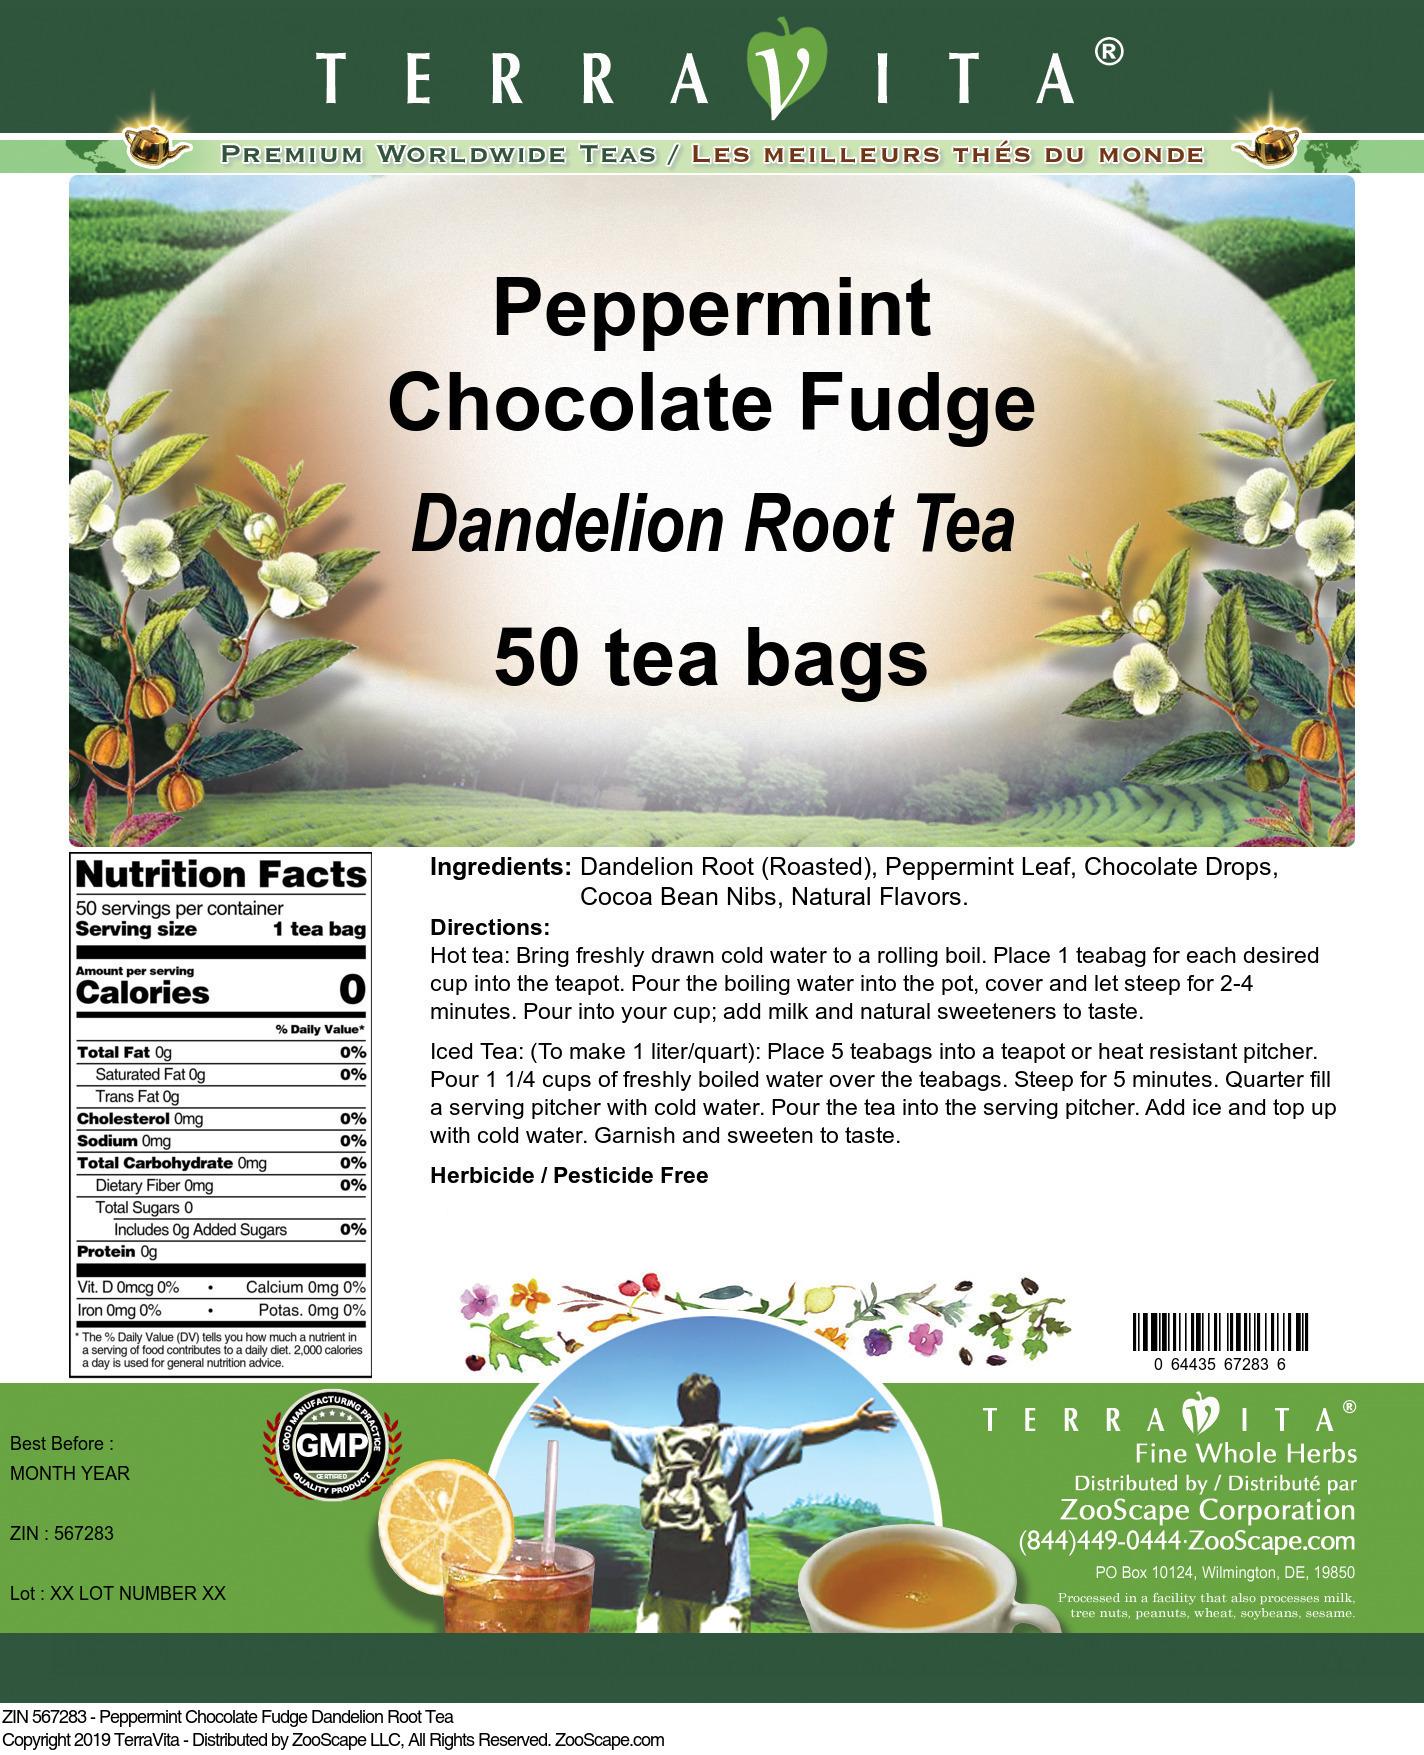 Peppermint Chocolate Fudge Dandelion Root Tea